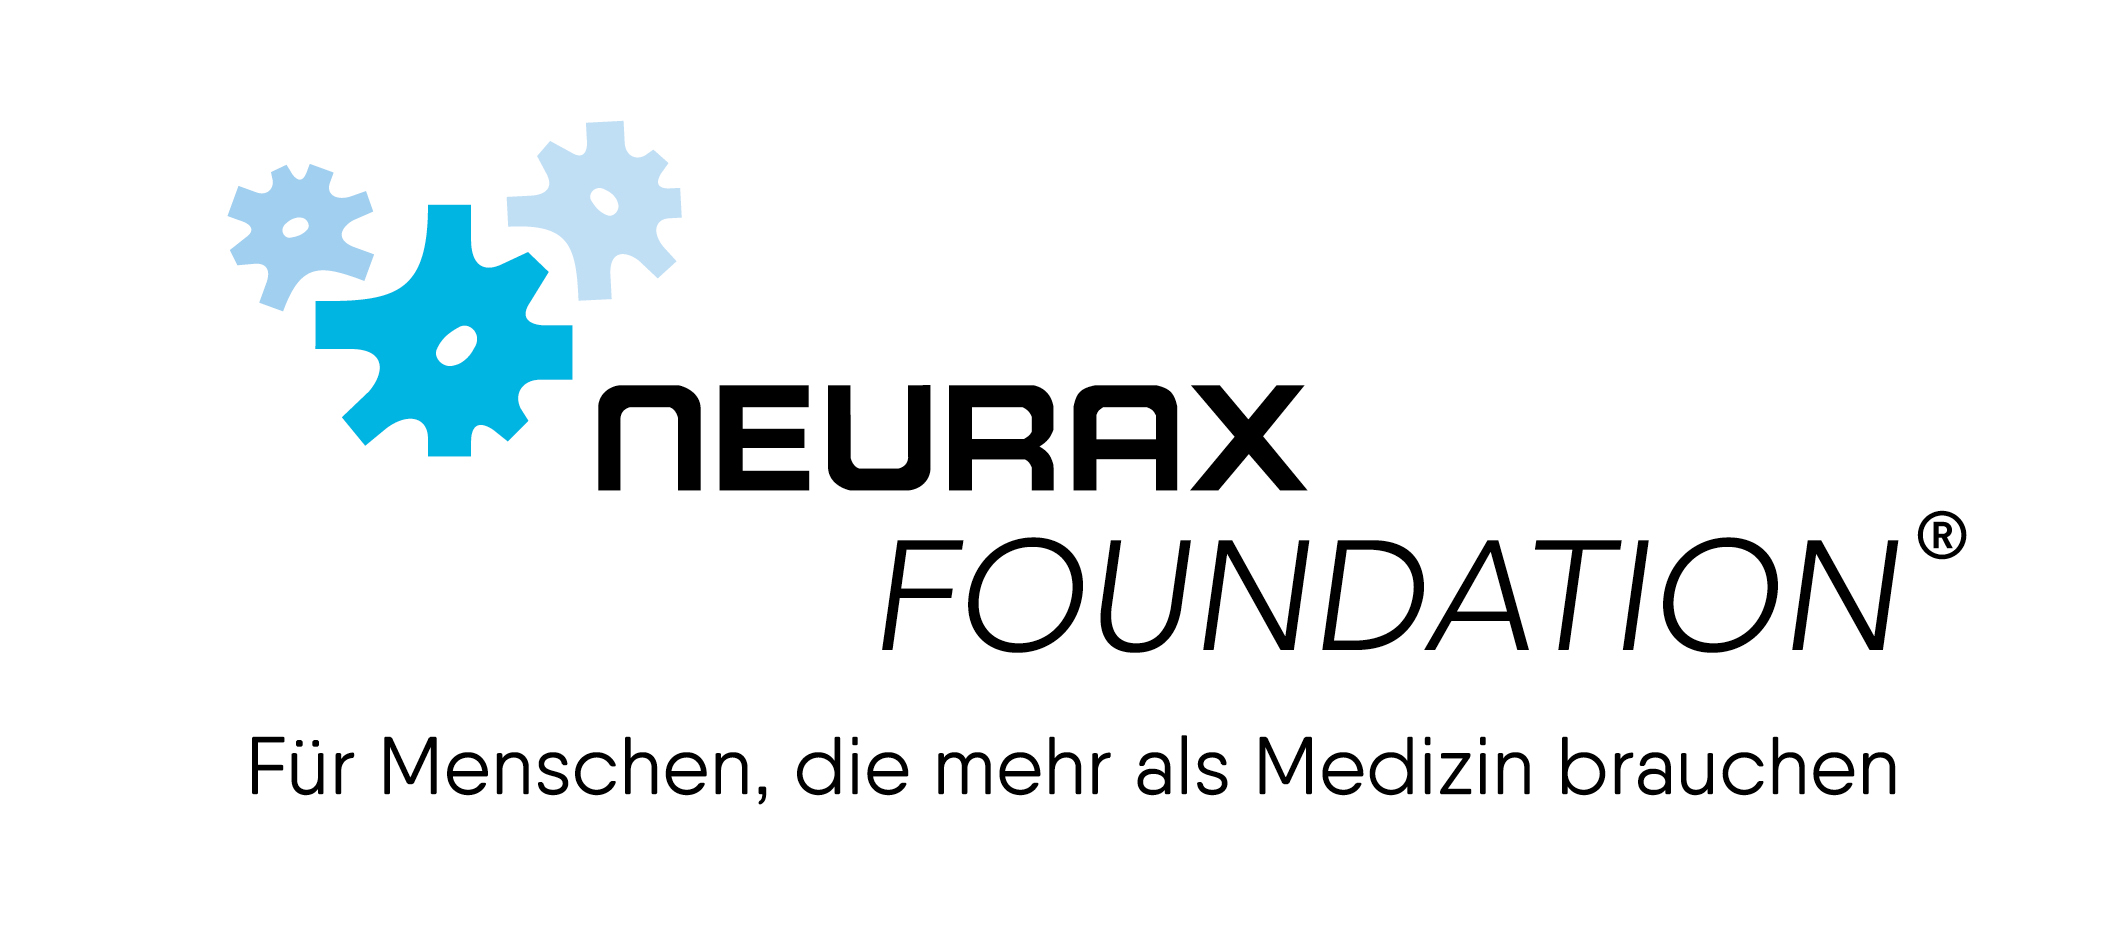 Logo_NEURAX_FOUNDATION_mit_claim